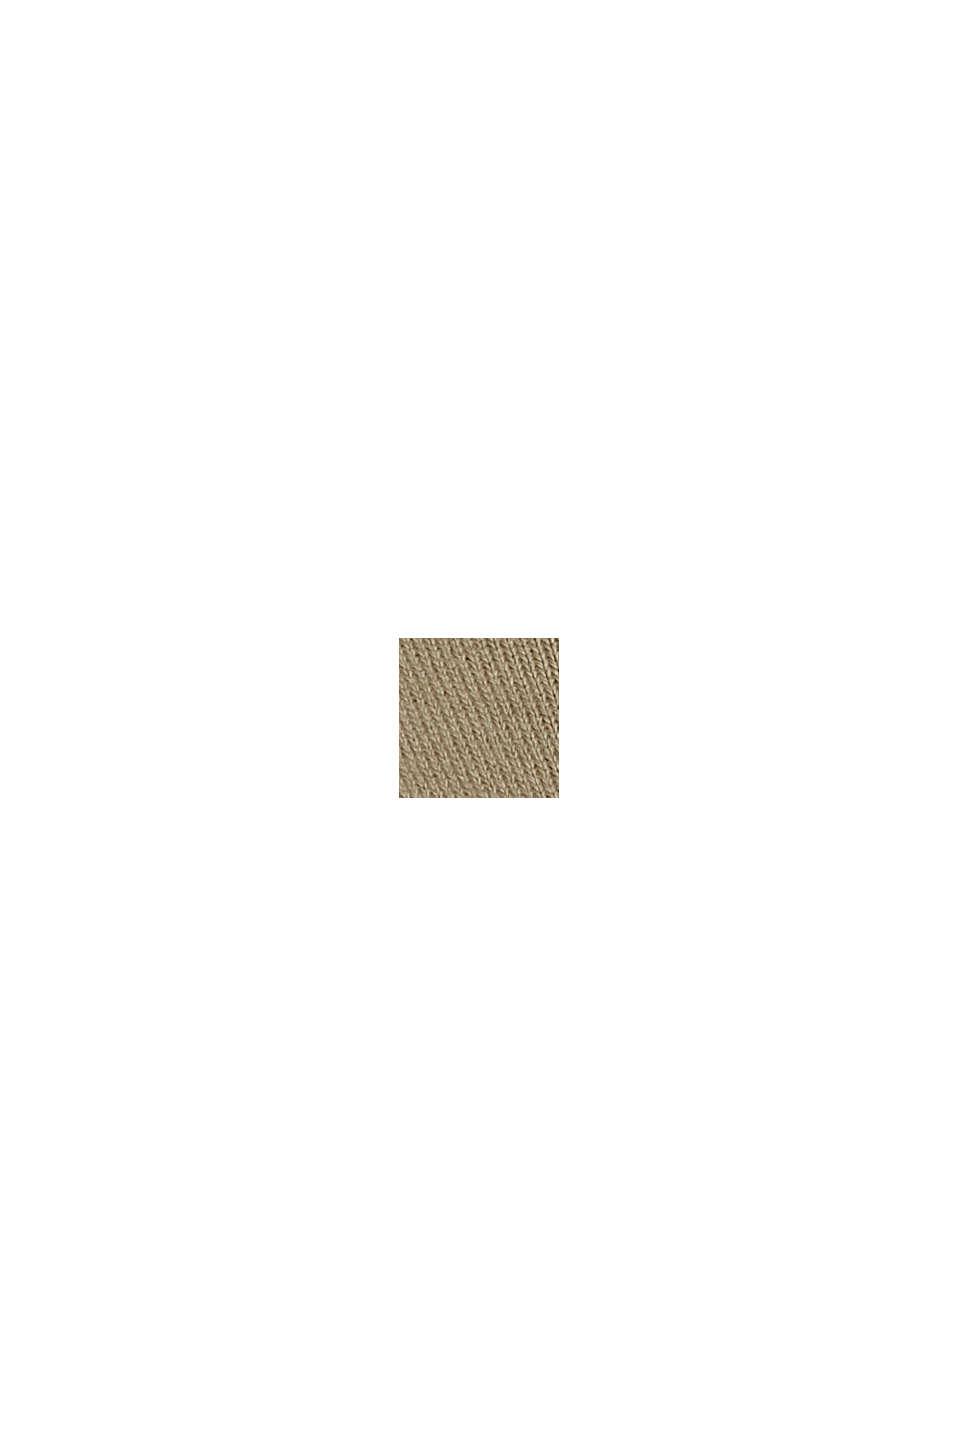 Sobrecamisa de felpa con diseño oversize, 100 % algodón ecológico, LIGHT KHAKI, swatch